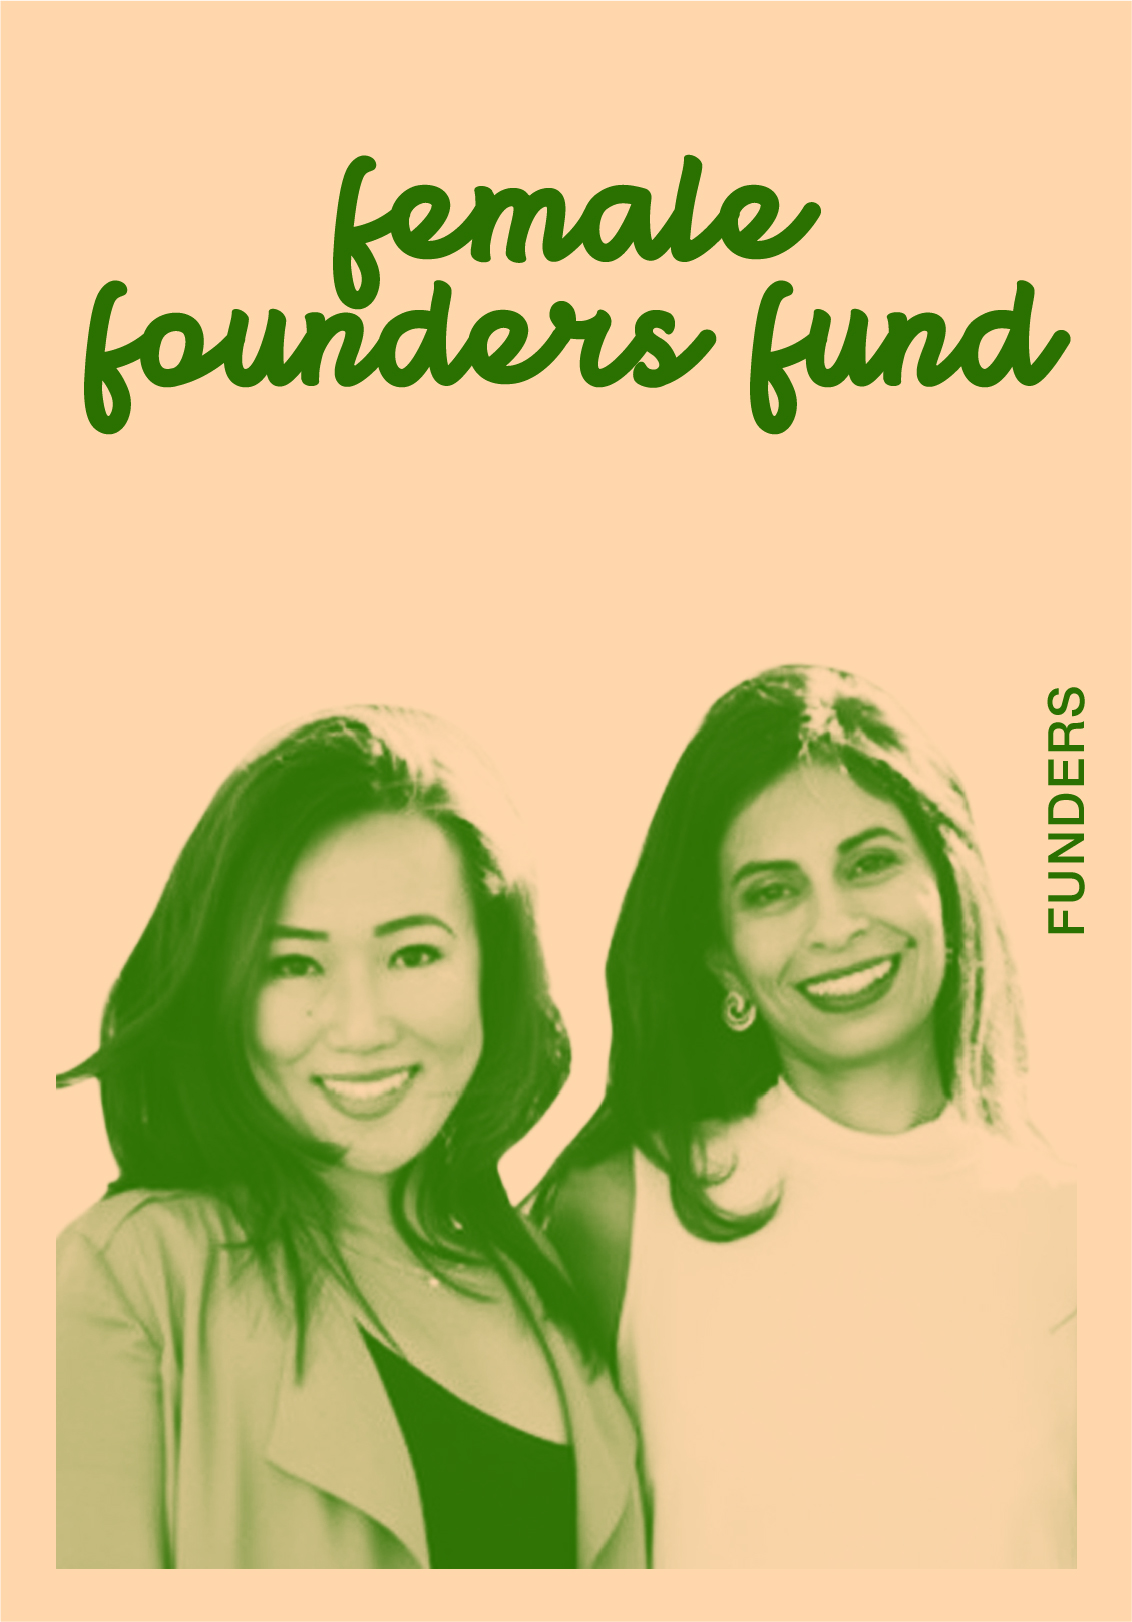 Female Founders Fund   WEBSITE   @FCUBEDVC   IG: FCUBEDVC